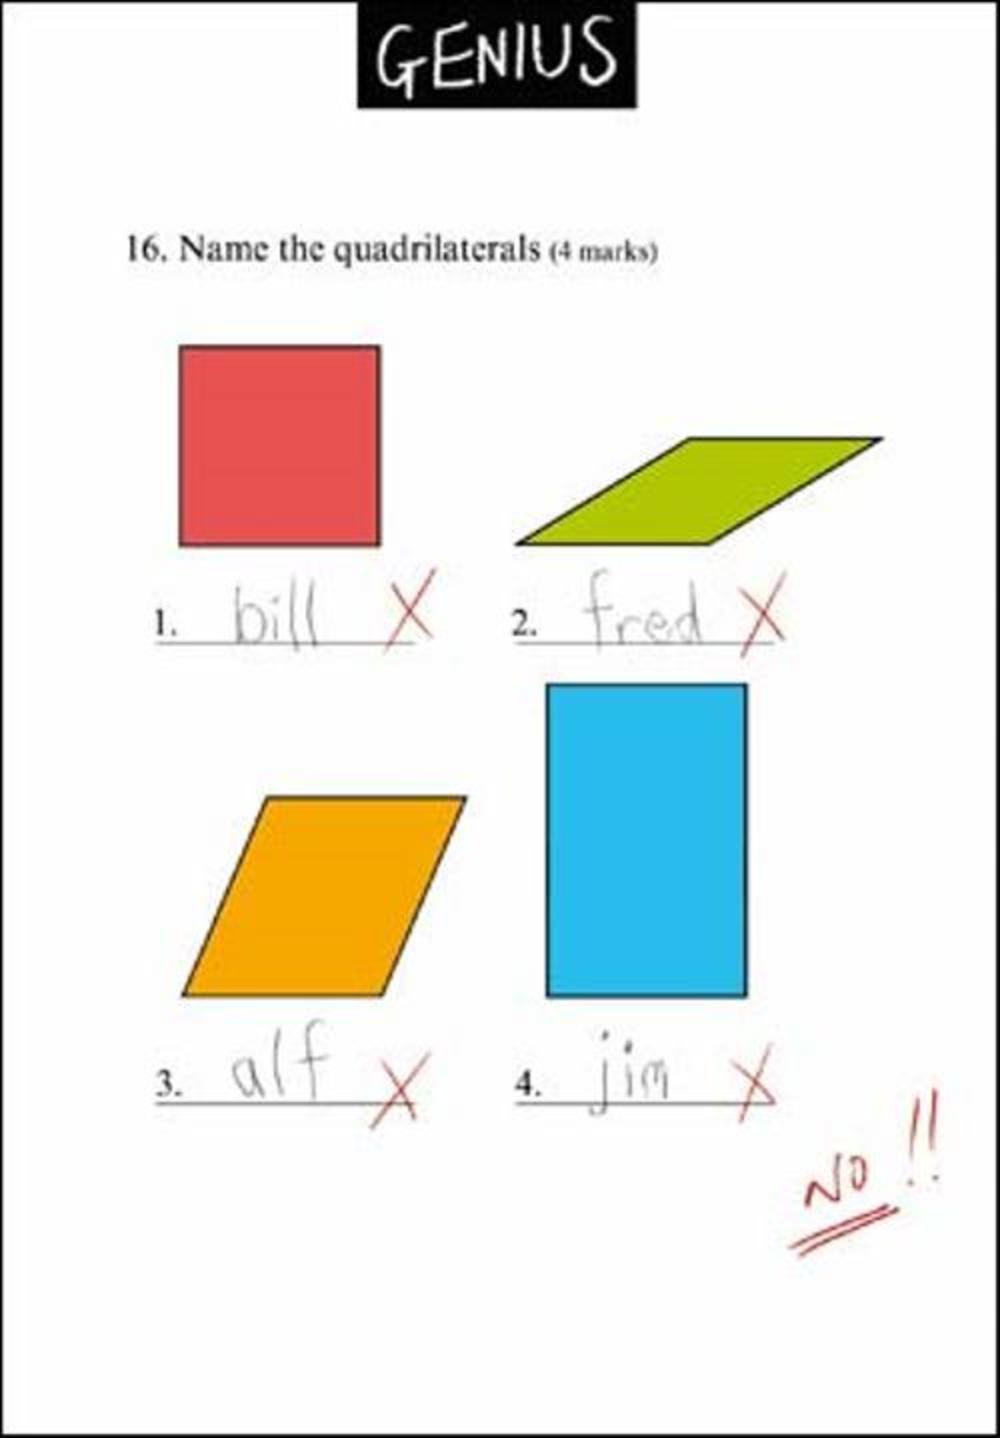 Name Quadrilaterals Funny Genius Greeting Card